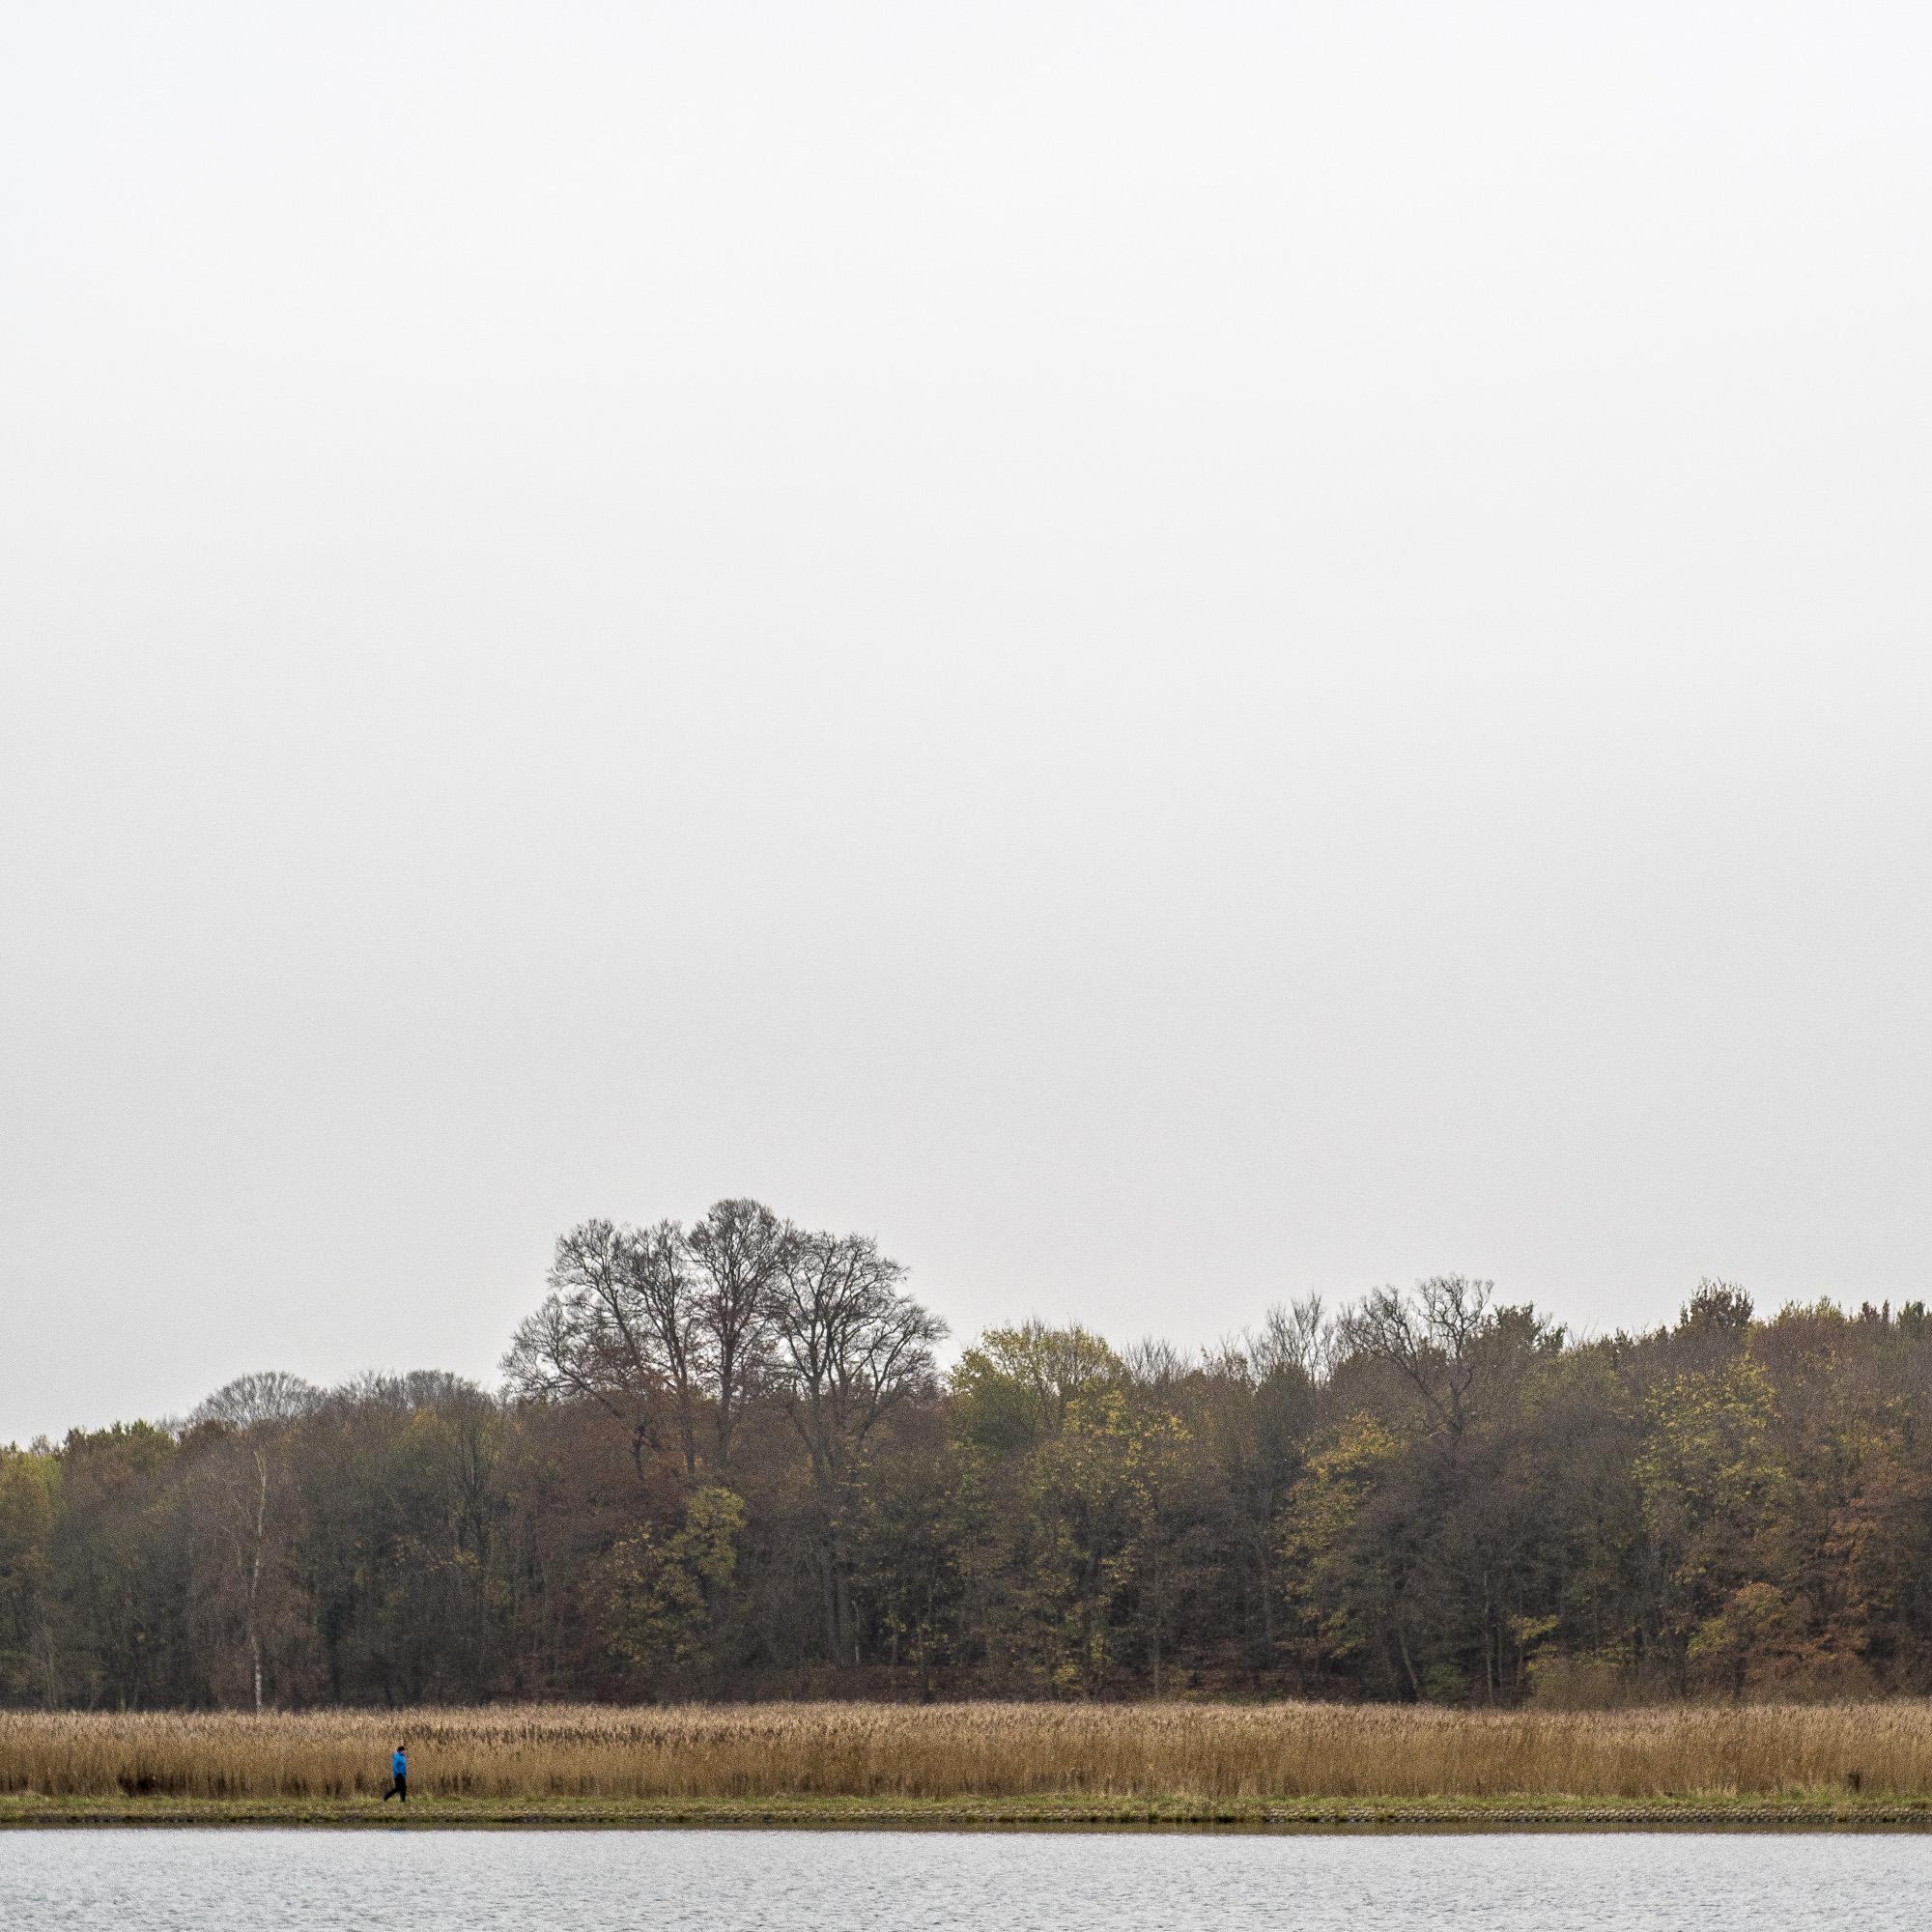 Jogger in Blau vor Schilfgürtel unter grauem Novemberhimmel